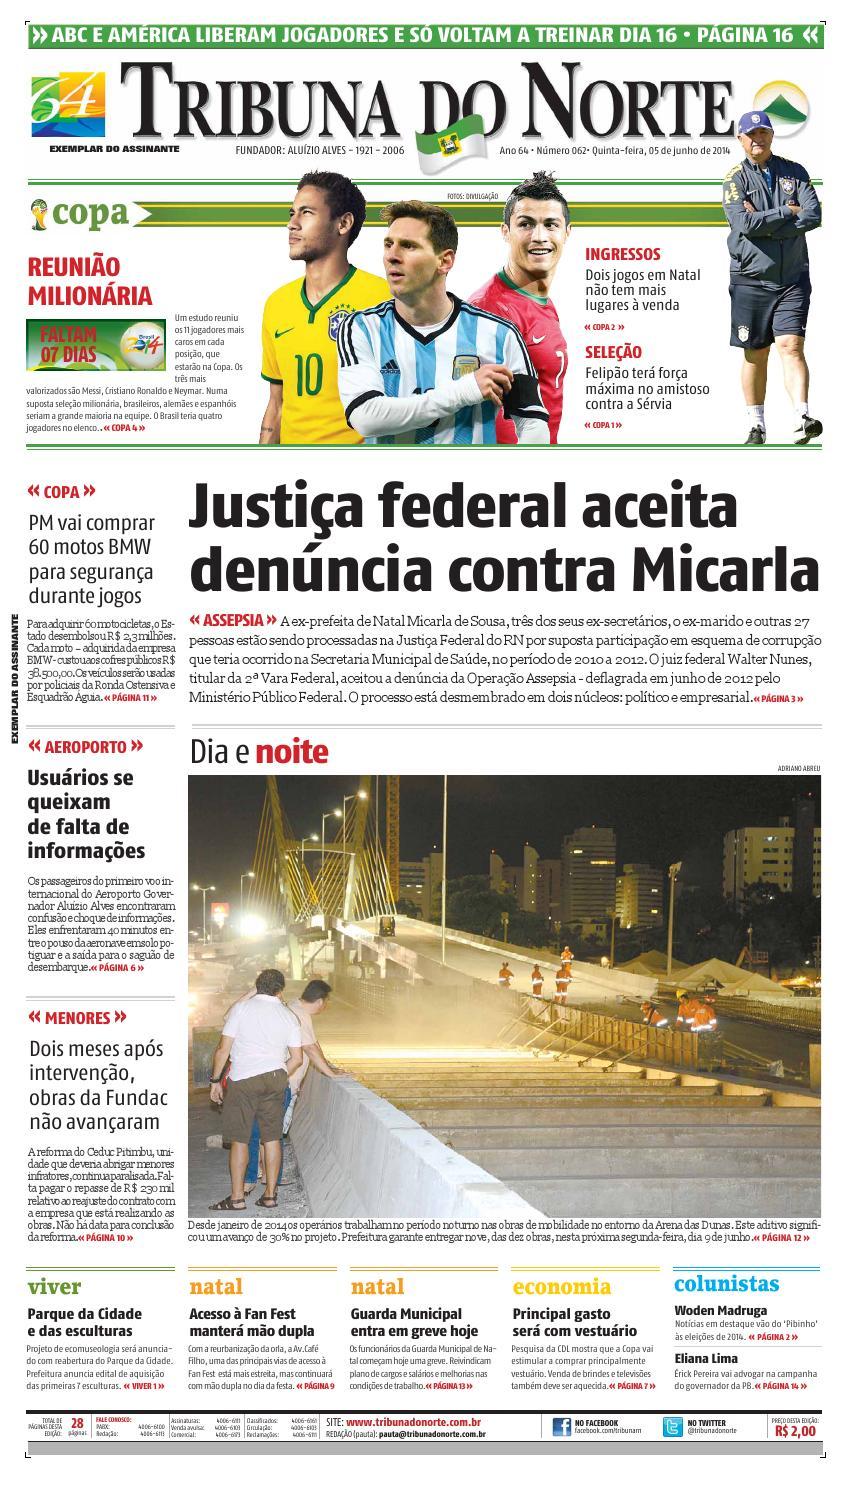 f955758b86 Tribuna do Norte - 05 06 2014 by Empresa Jornalística Tribuna do Norte Ltda  - issuu